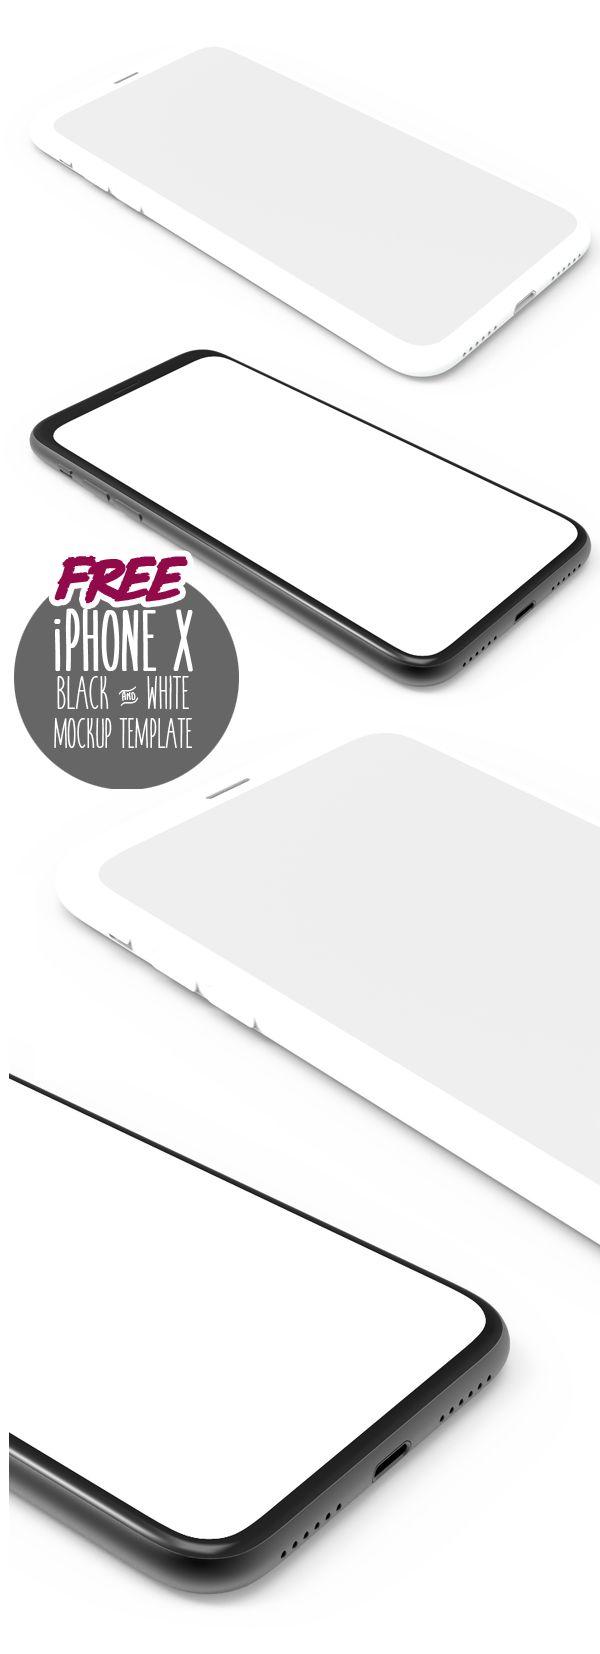 Download Free Iphone X Mockup Templates 28 Mock Ups Freebies Graphic Design Junction Mockup Templates Templates Mockup